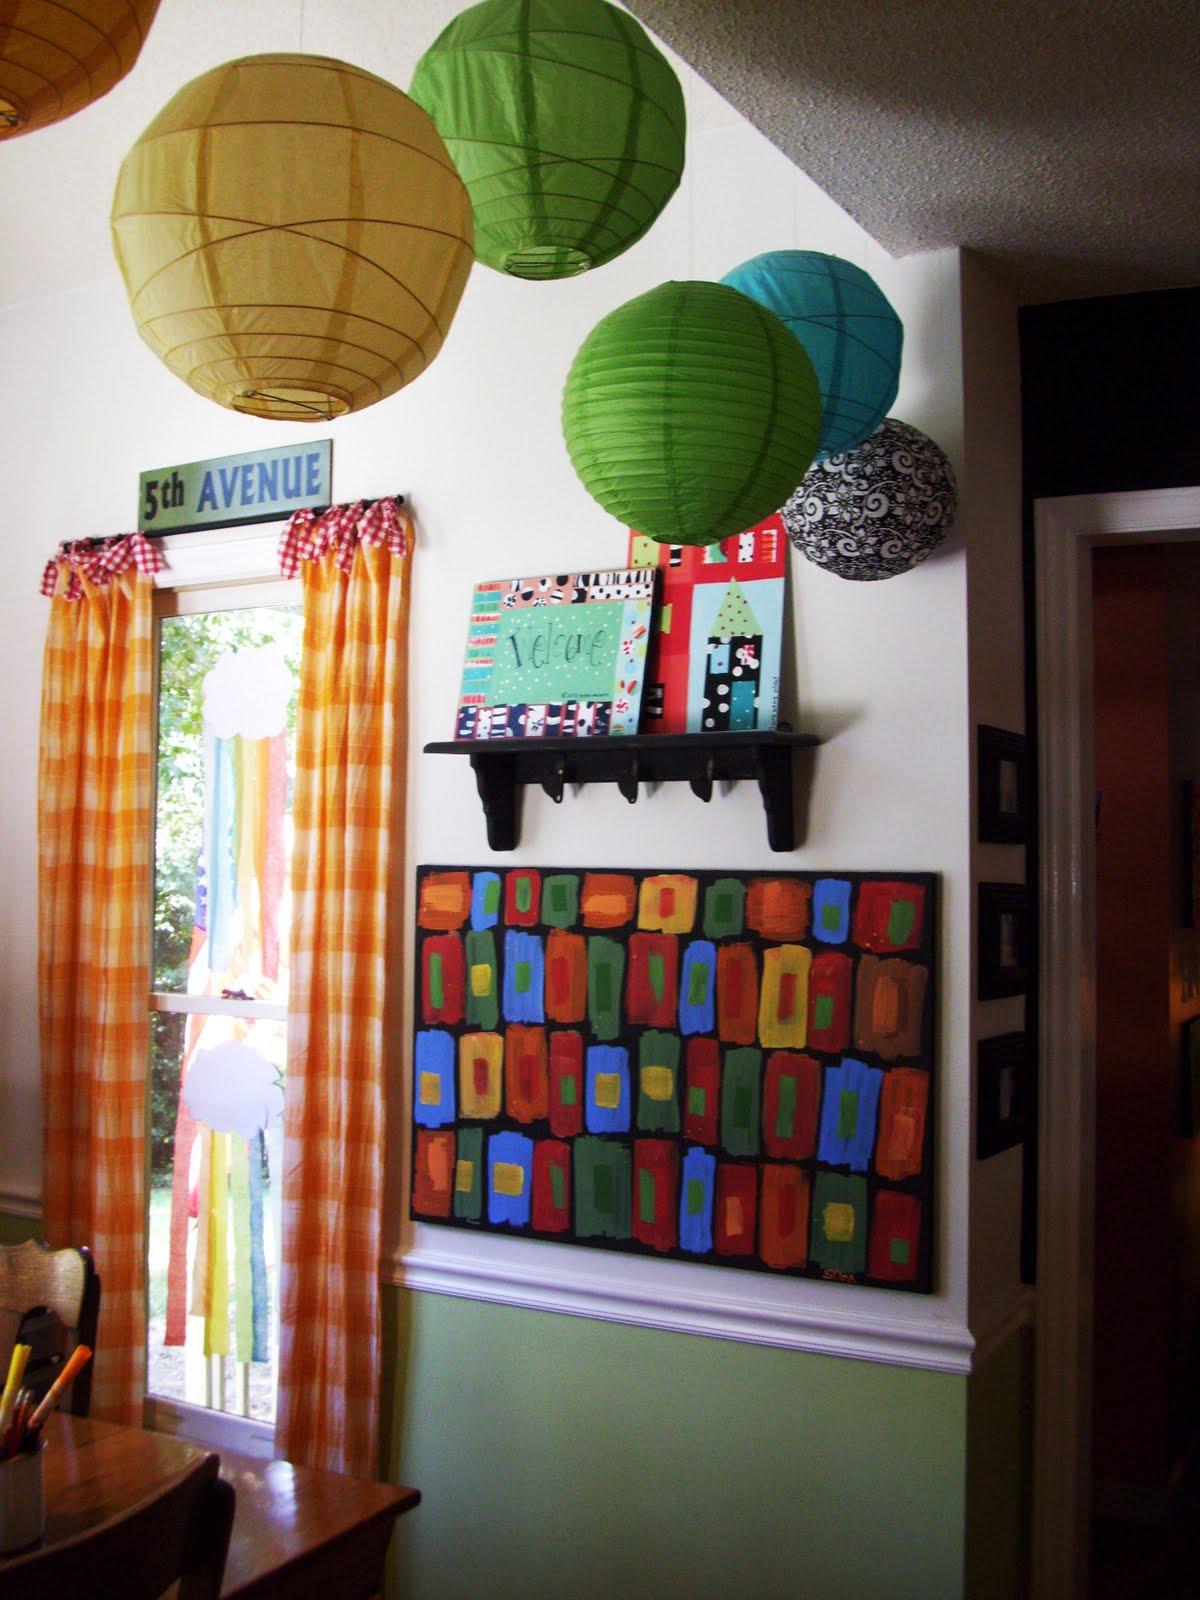 sara's art* house: kitchen and living room decor